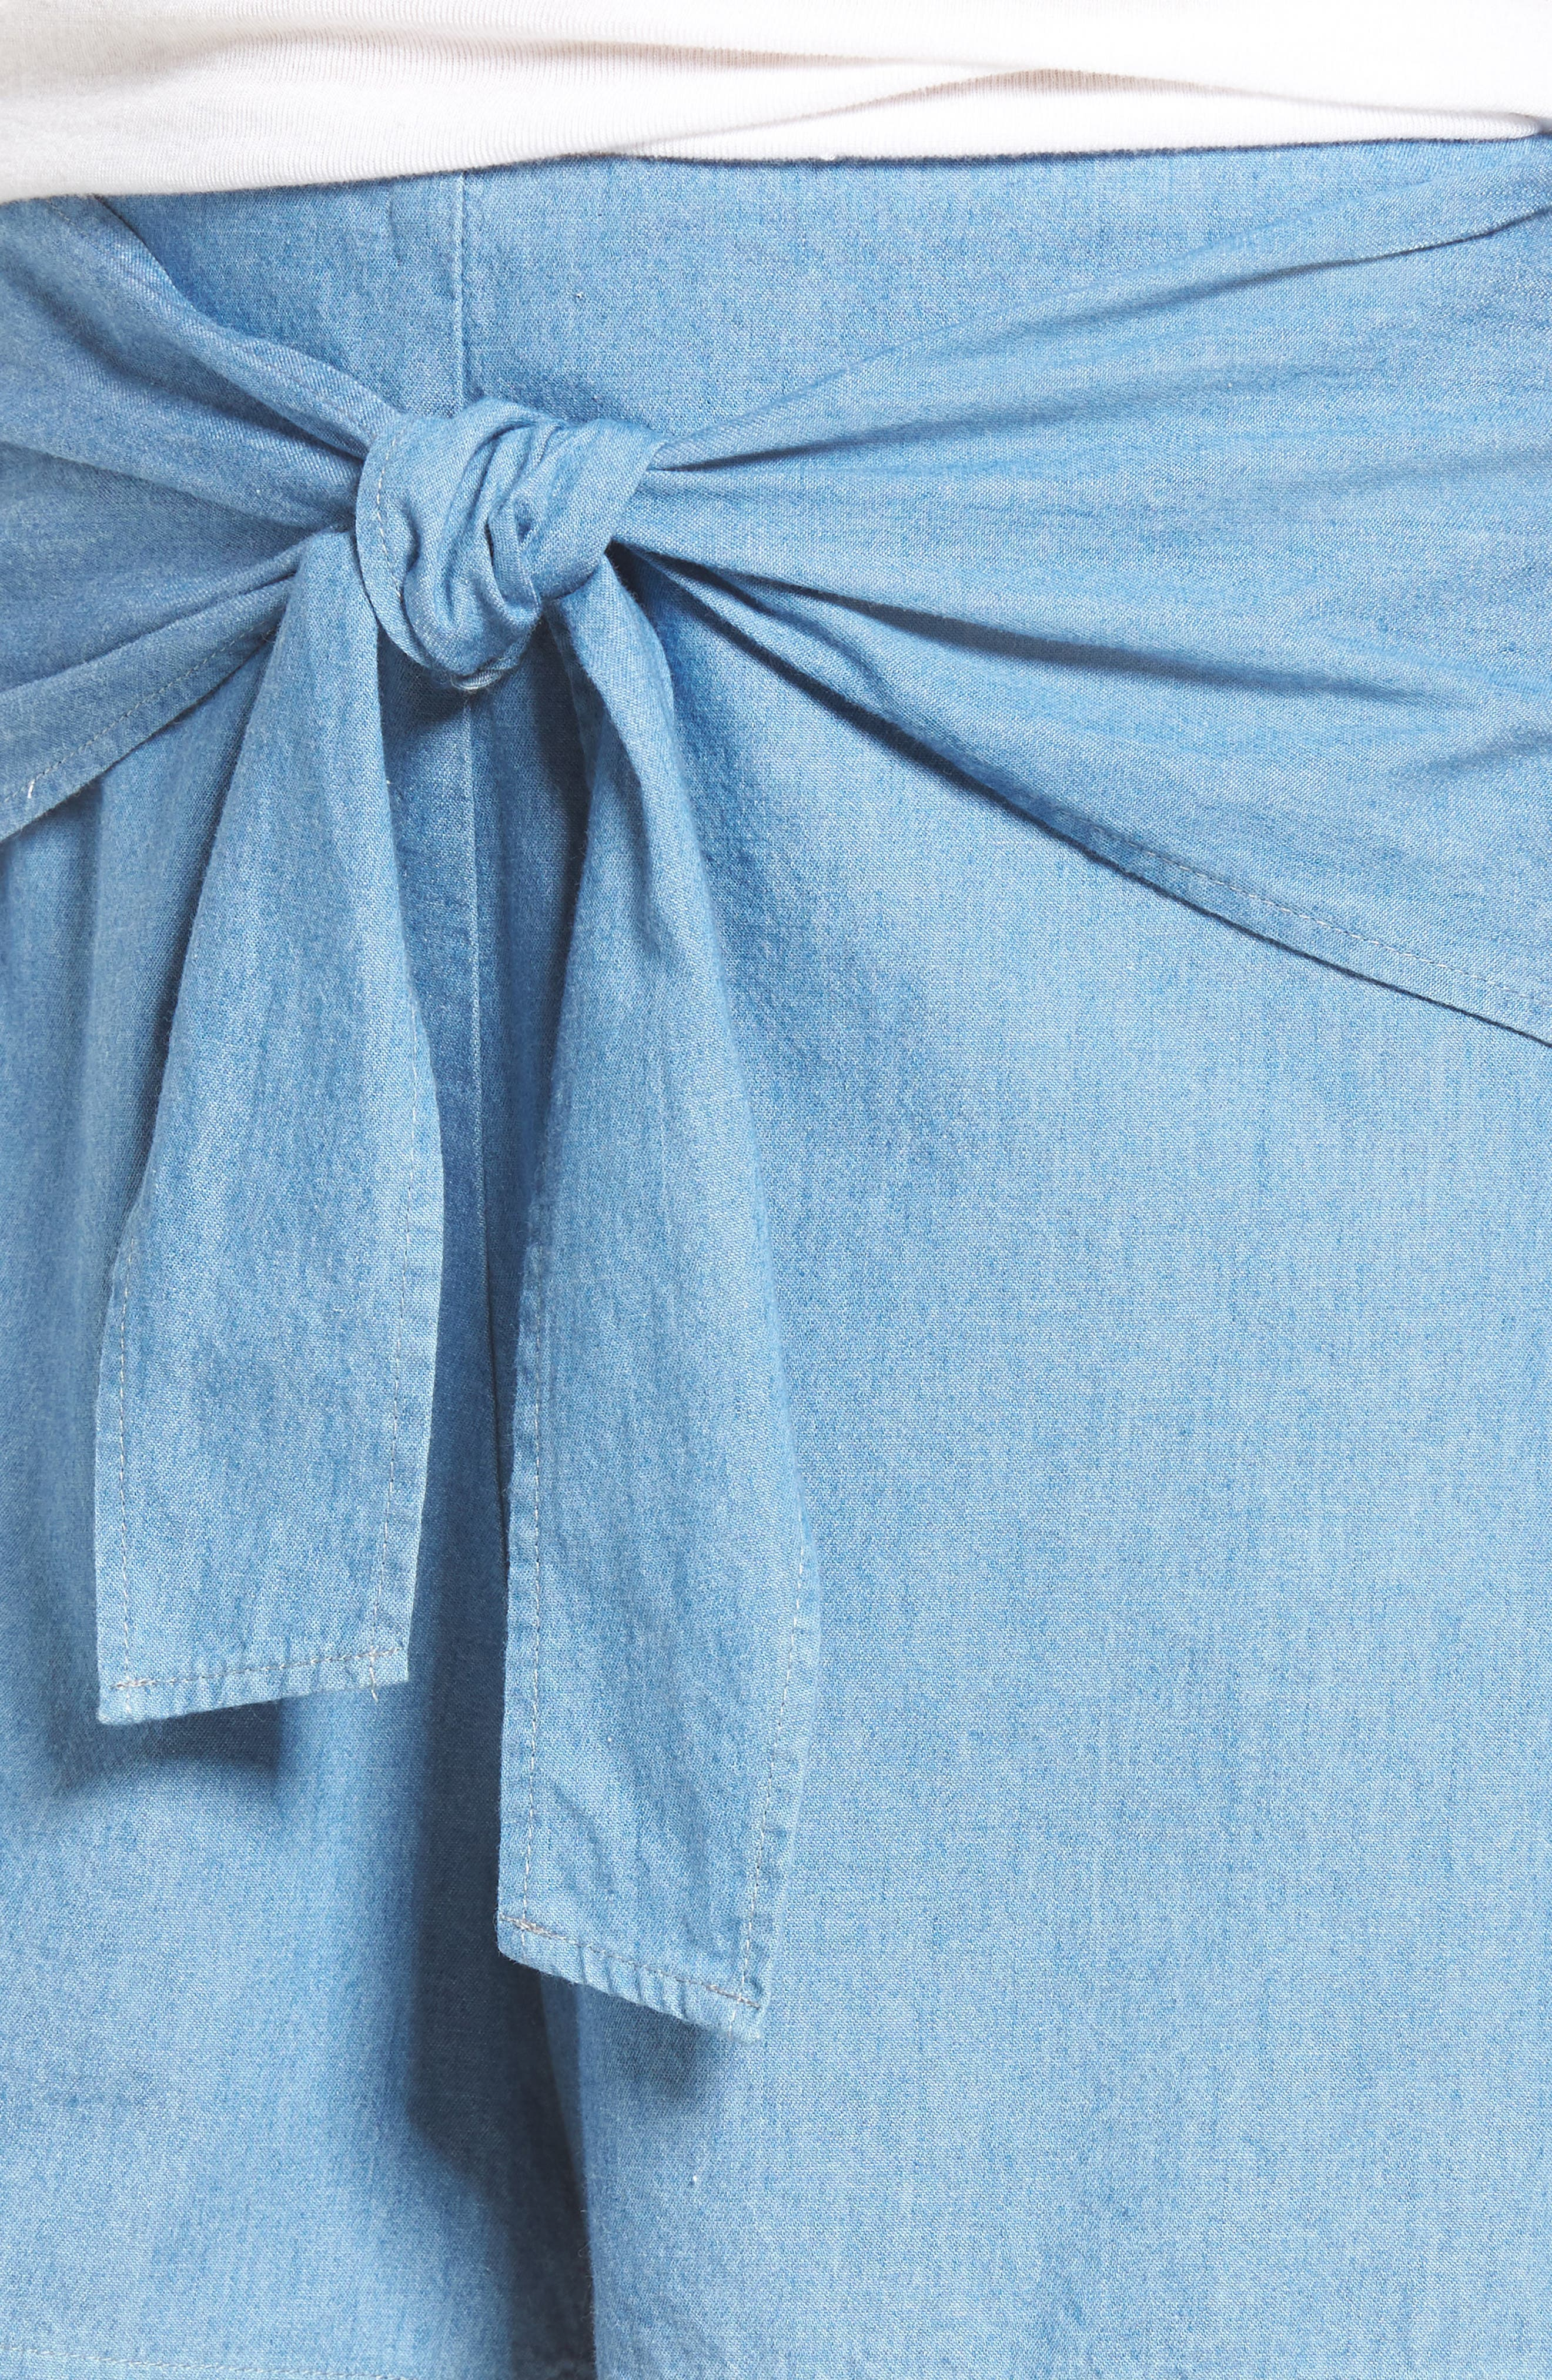 Tie Front Shorts,                             Alternate thumbnail 4, color,                             400